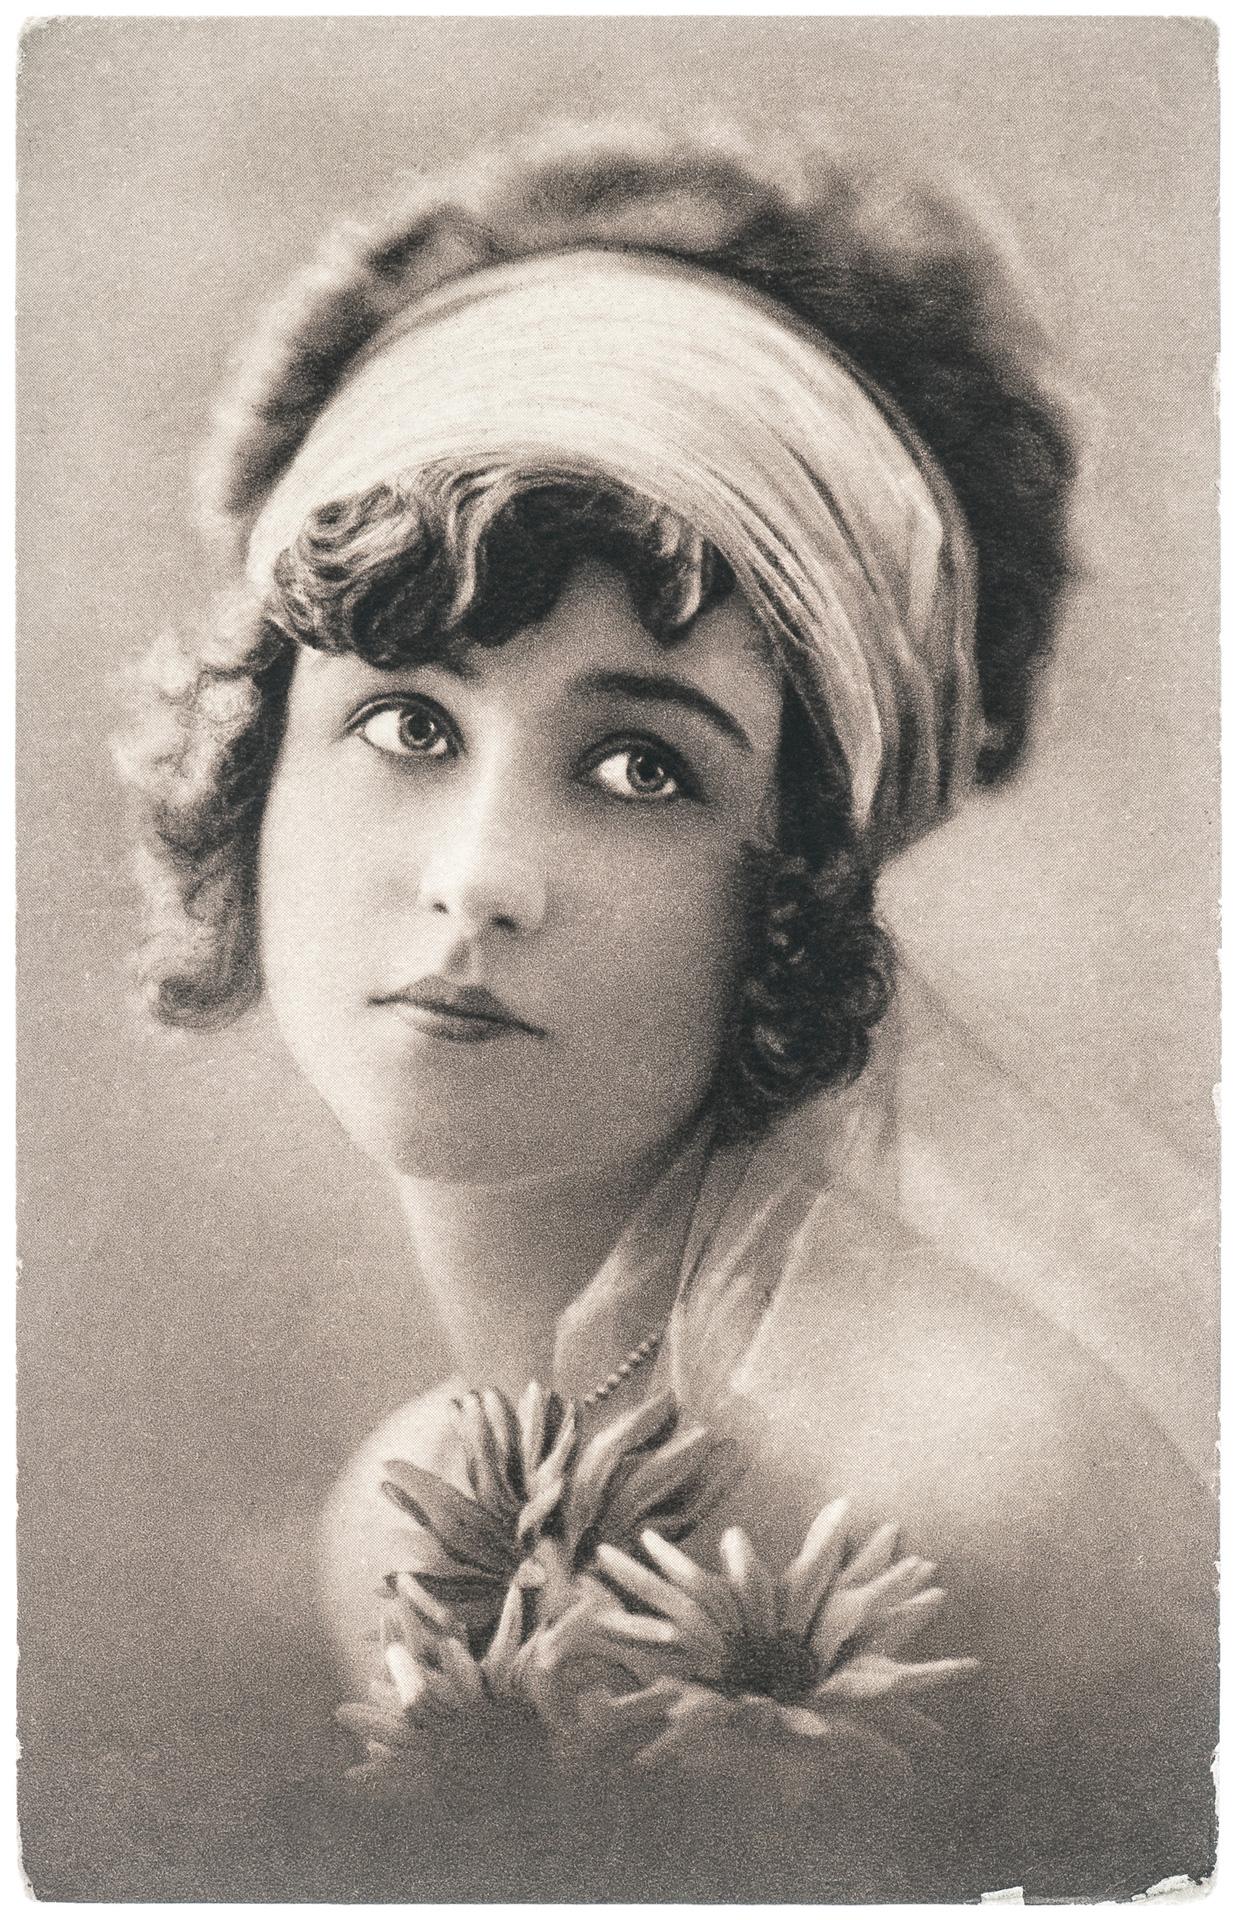 Woman with an elegant makeup